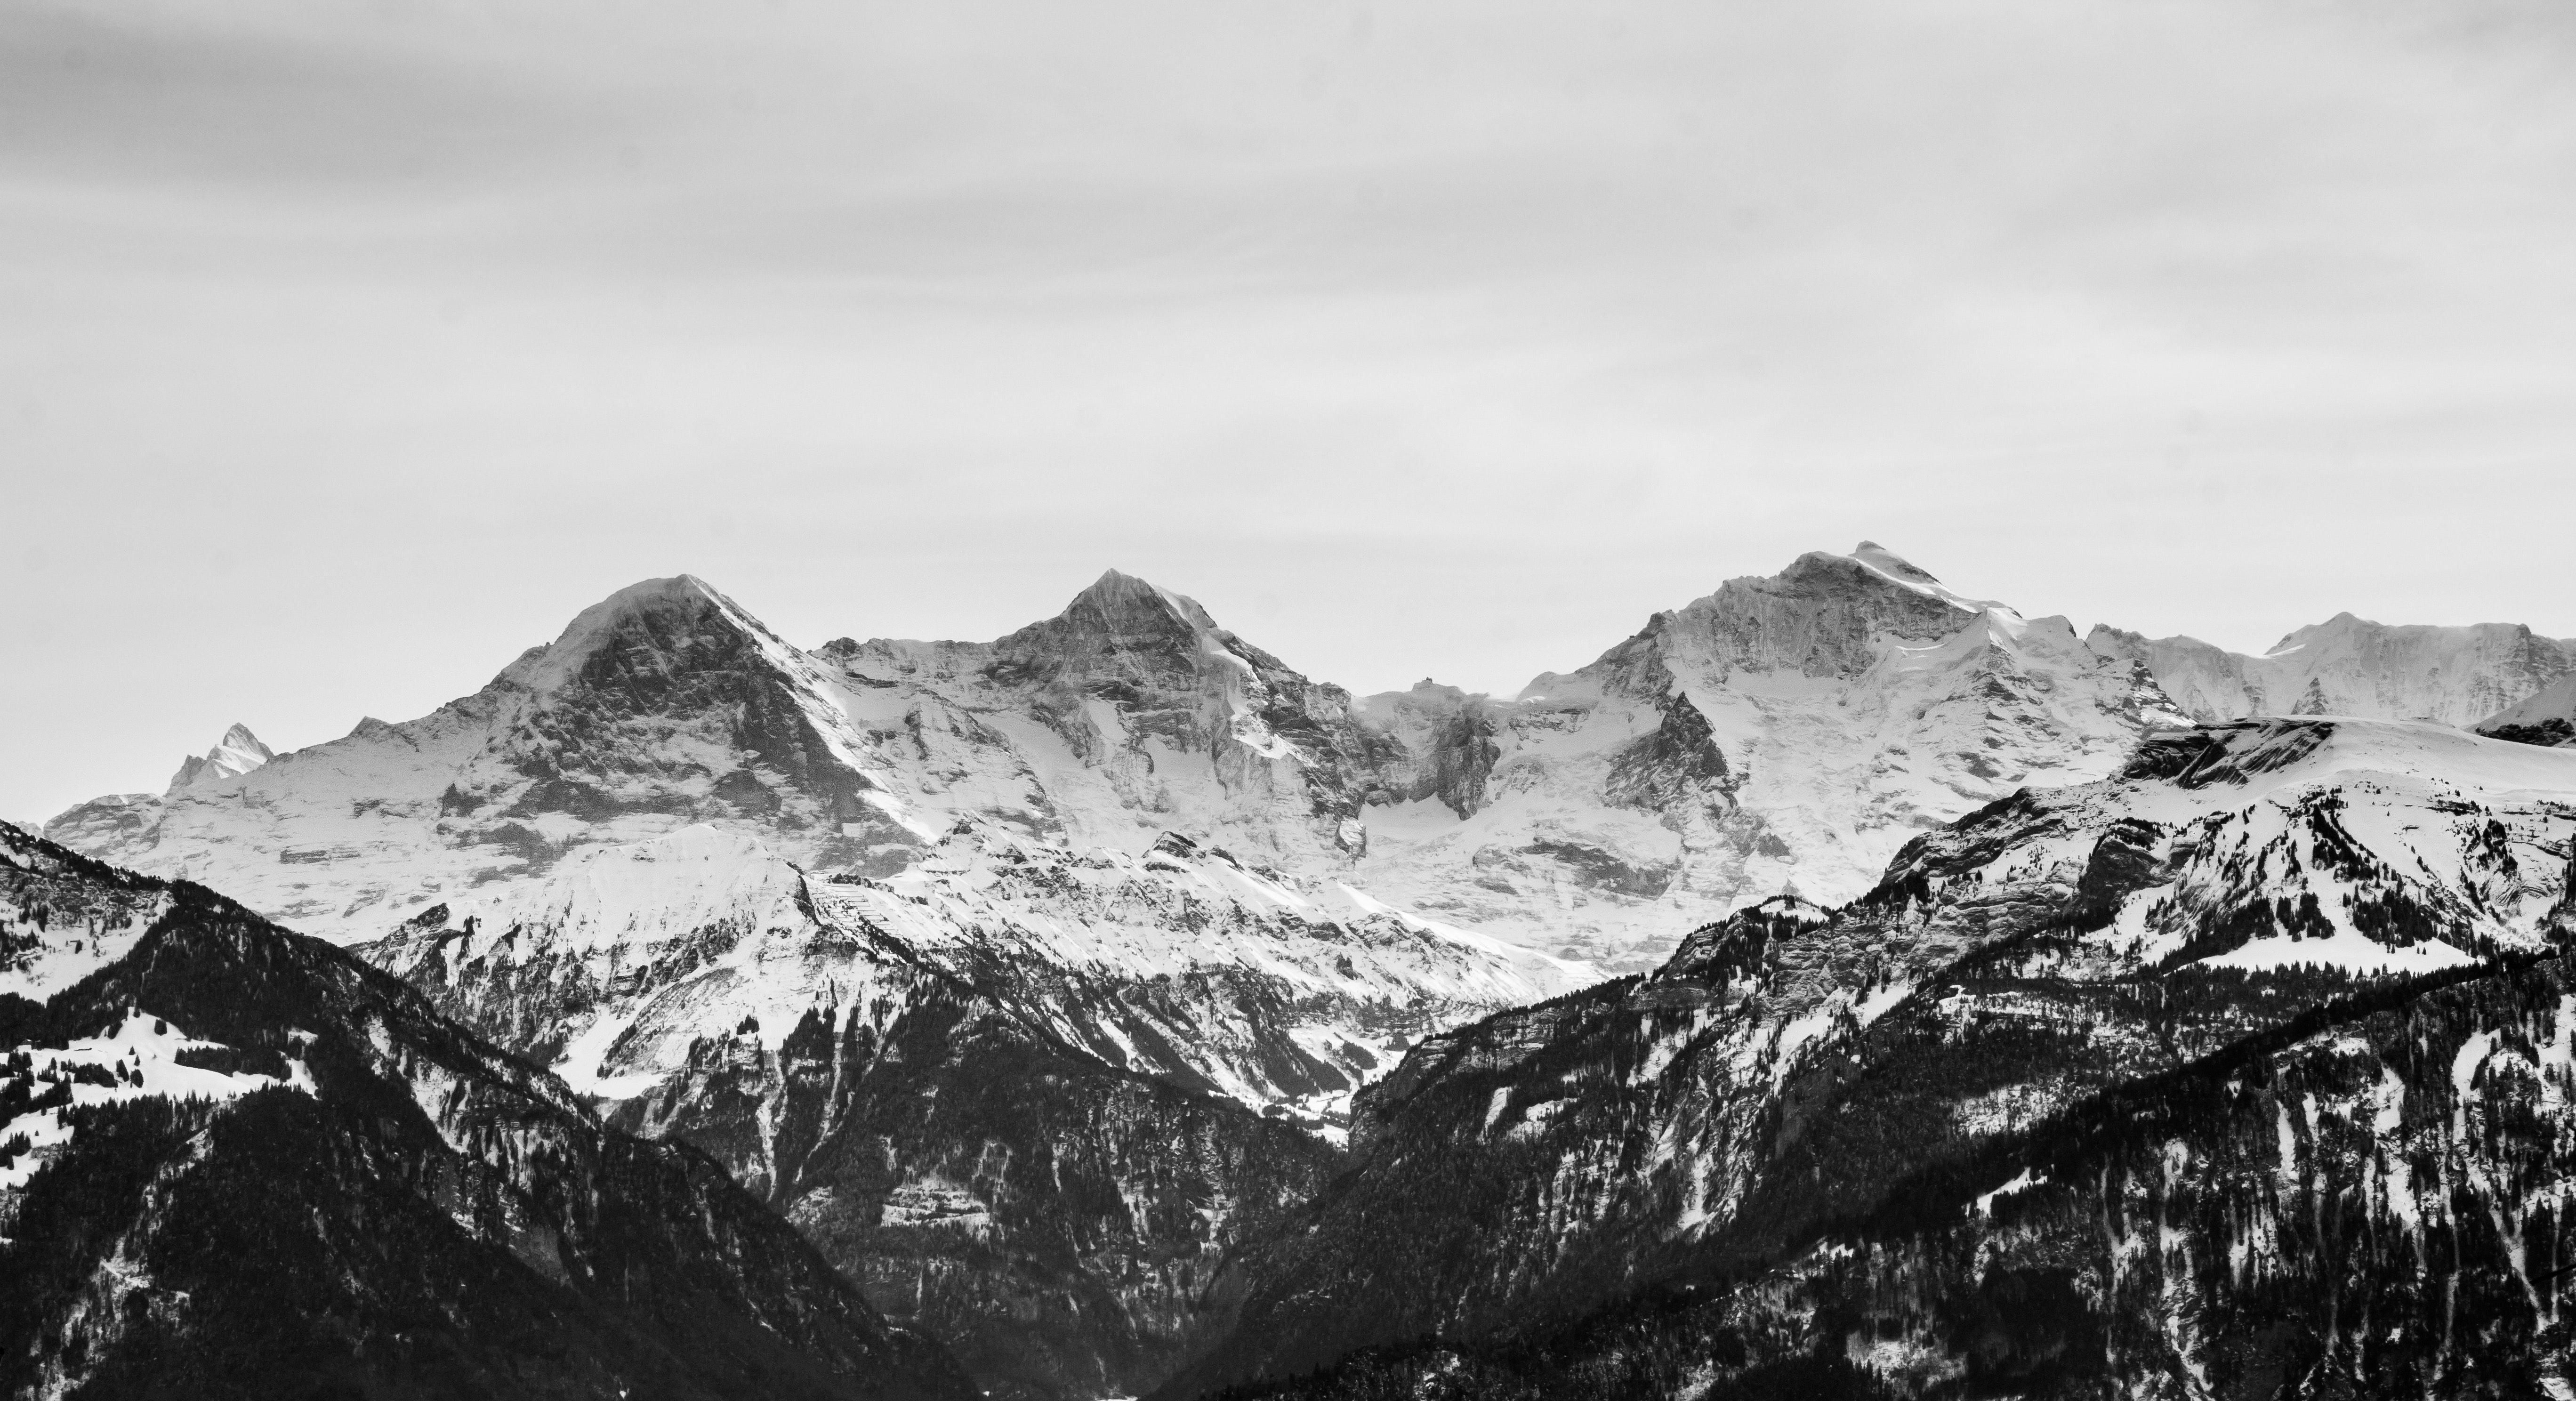 General 5472x2976 landscape nature mountains snow snowy mountain snowy peak monochrome sky